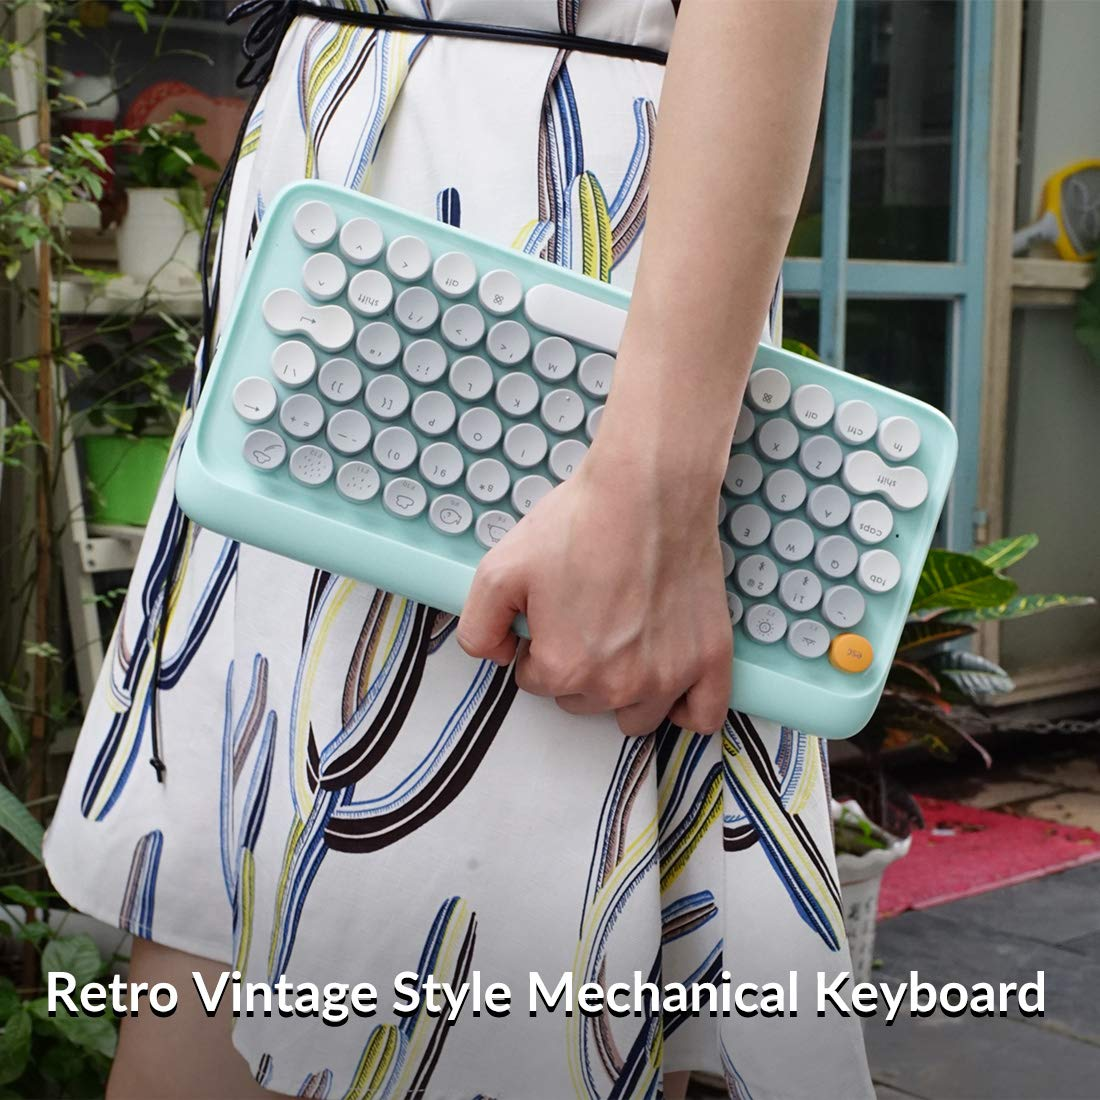 LOFREE Four Seasons Retro Vintage Mechanical Keyboard